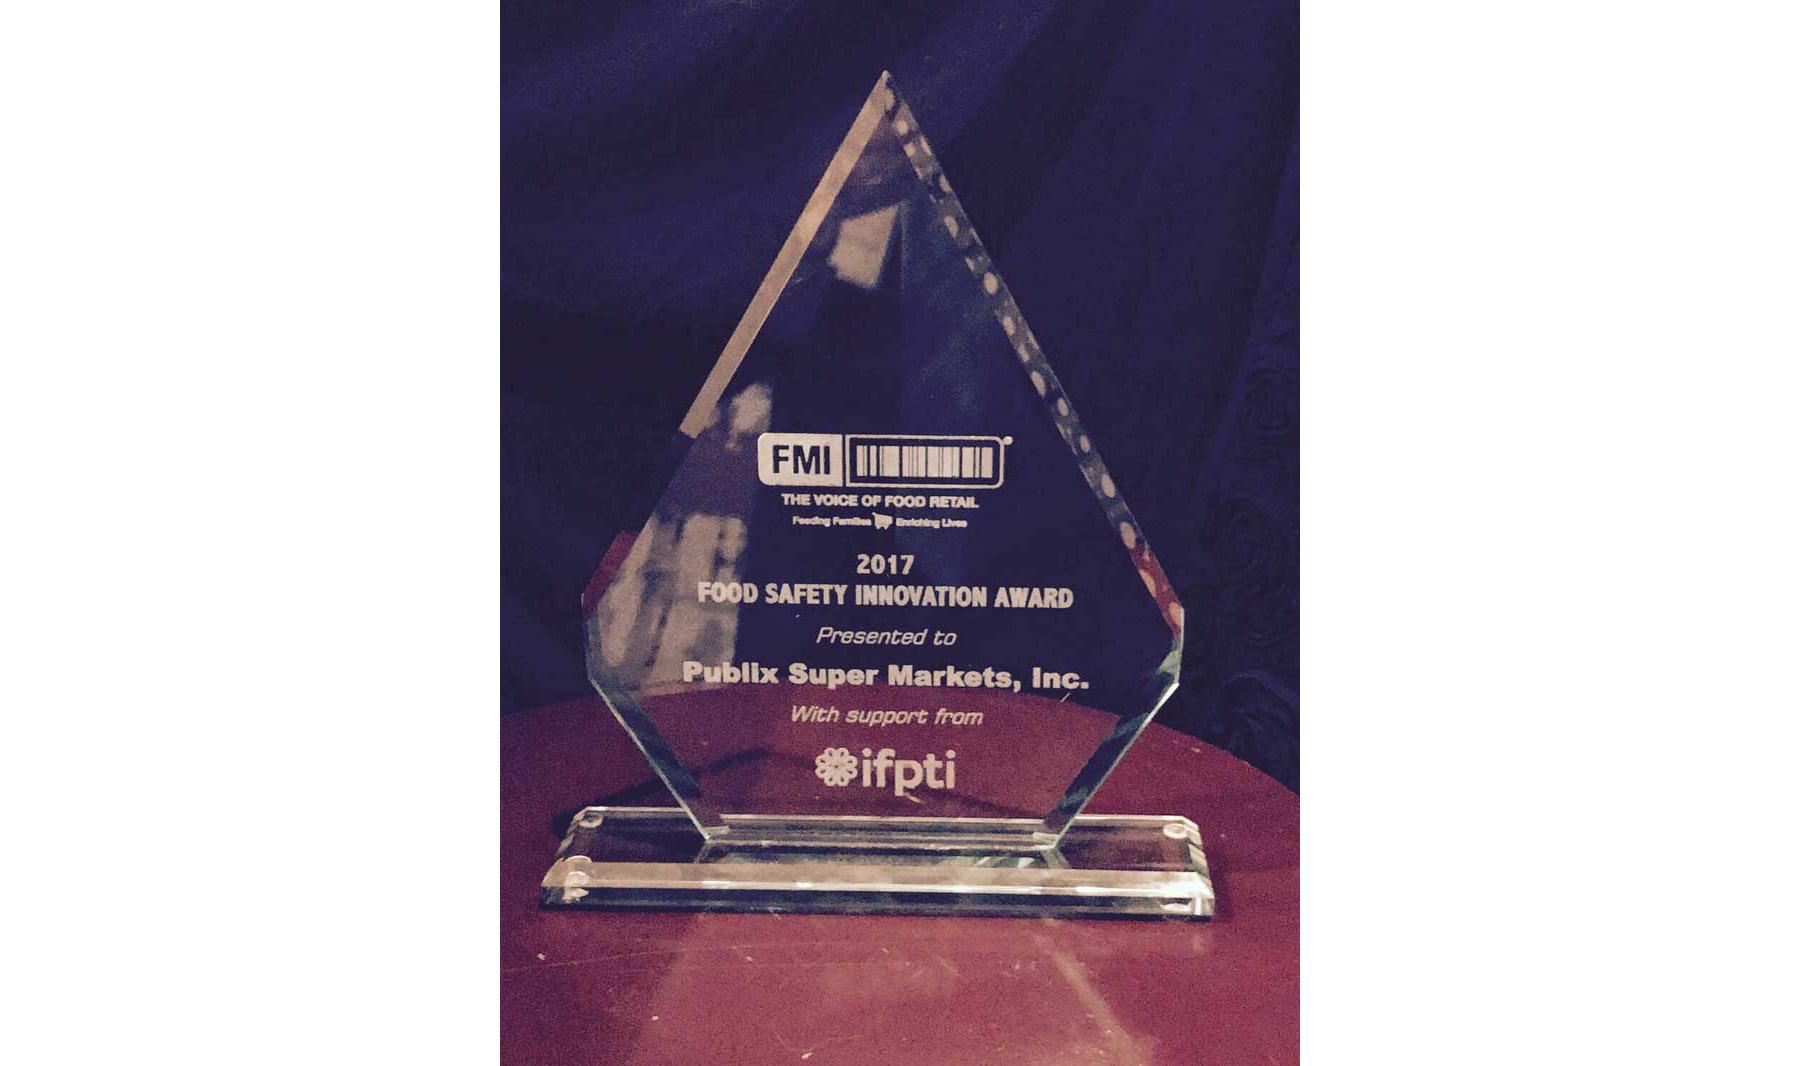 FMI's Food Safety Innovation award